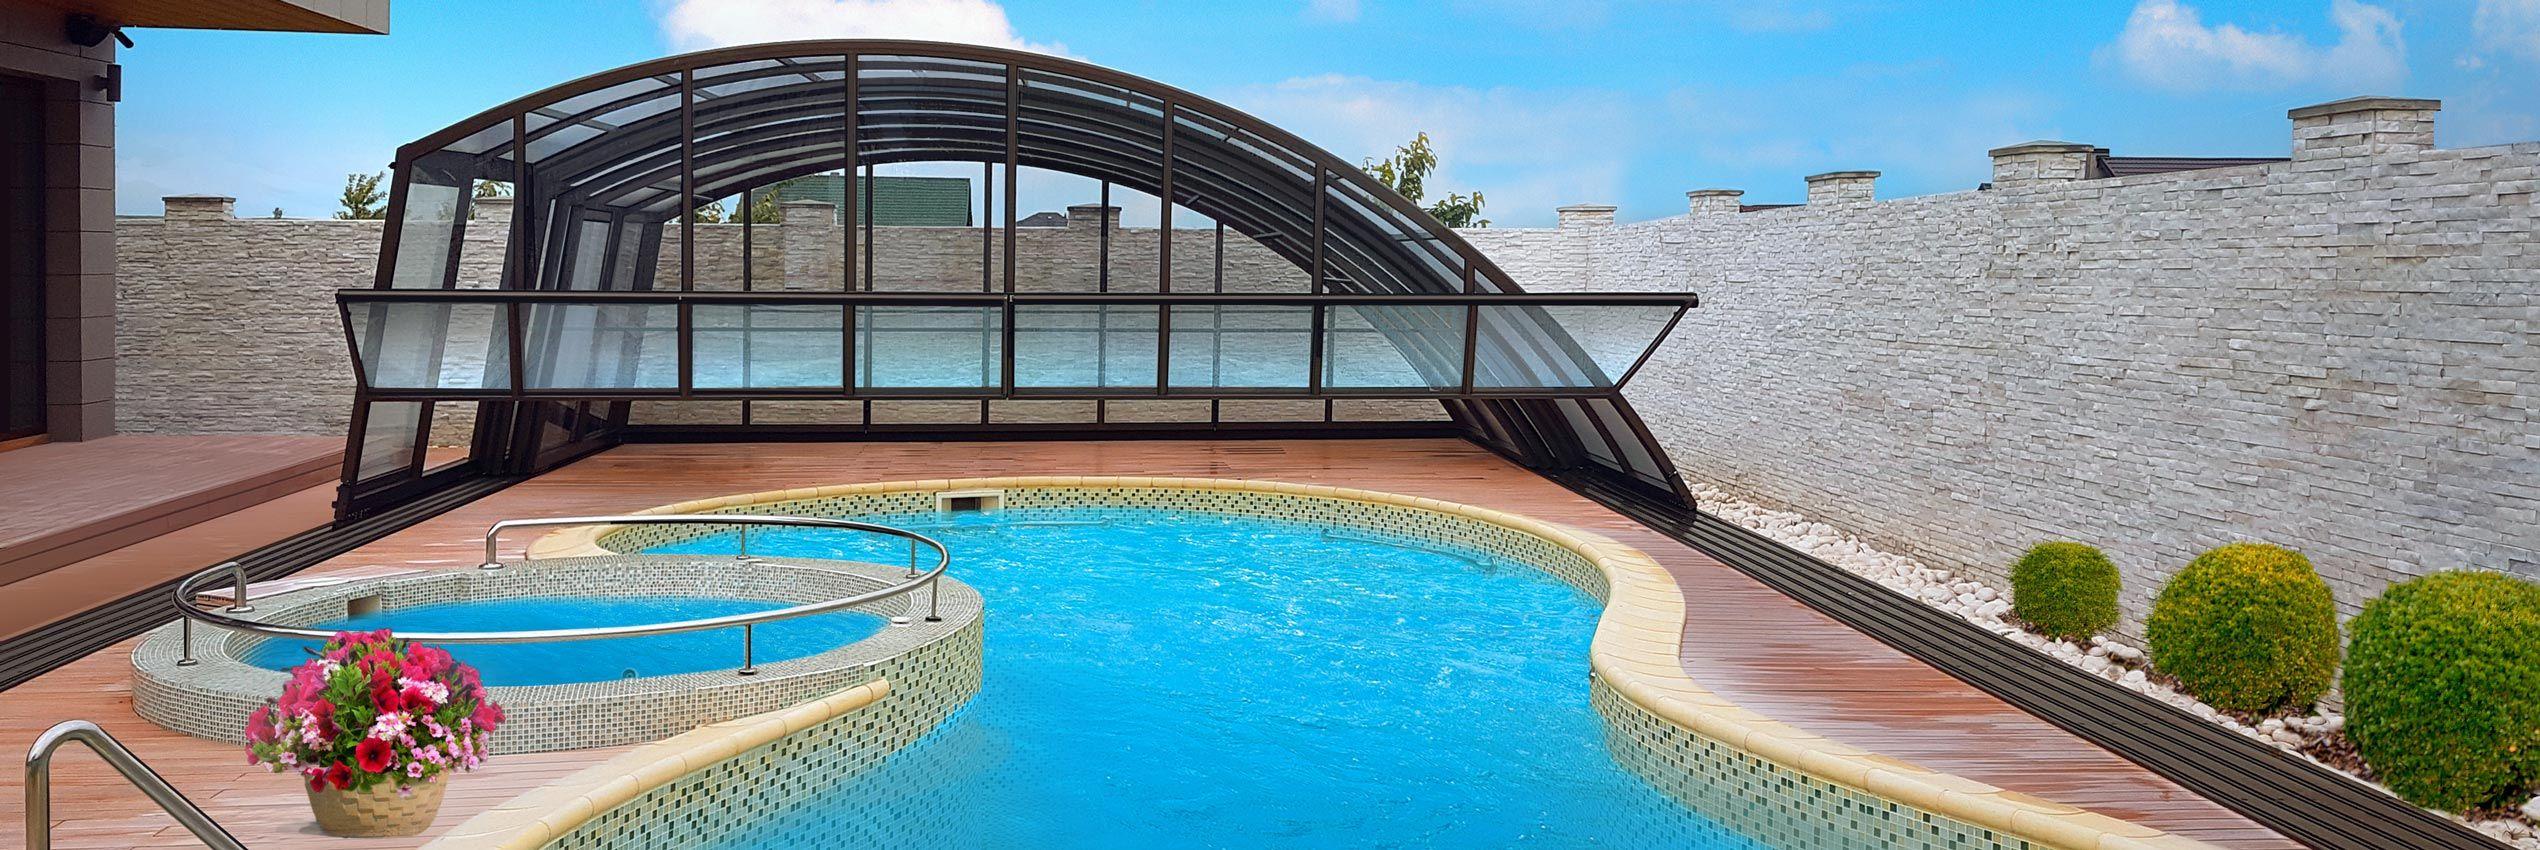 abri de piscine ravena. Black Bedroom Furniture Sets. Home Design Ideas